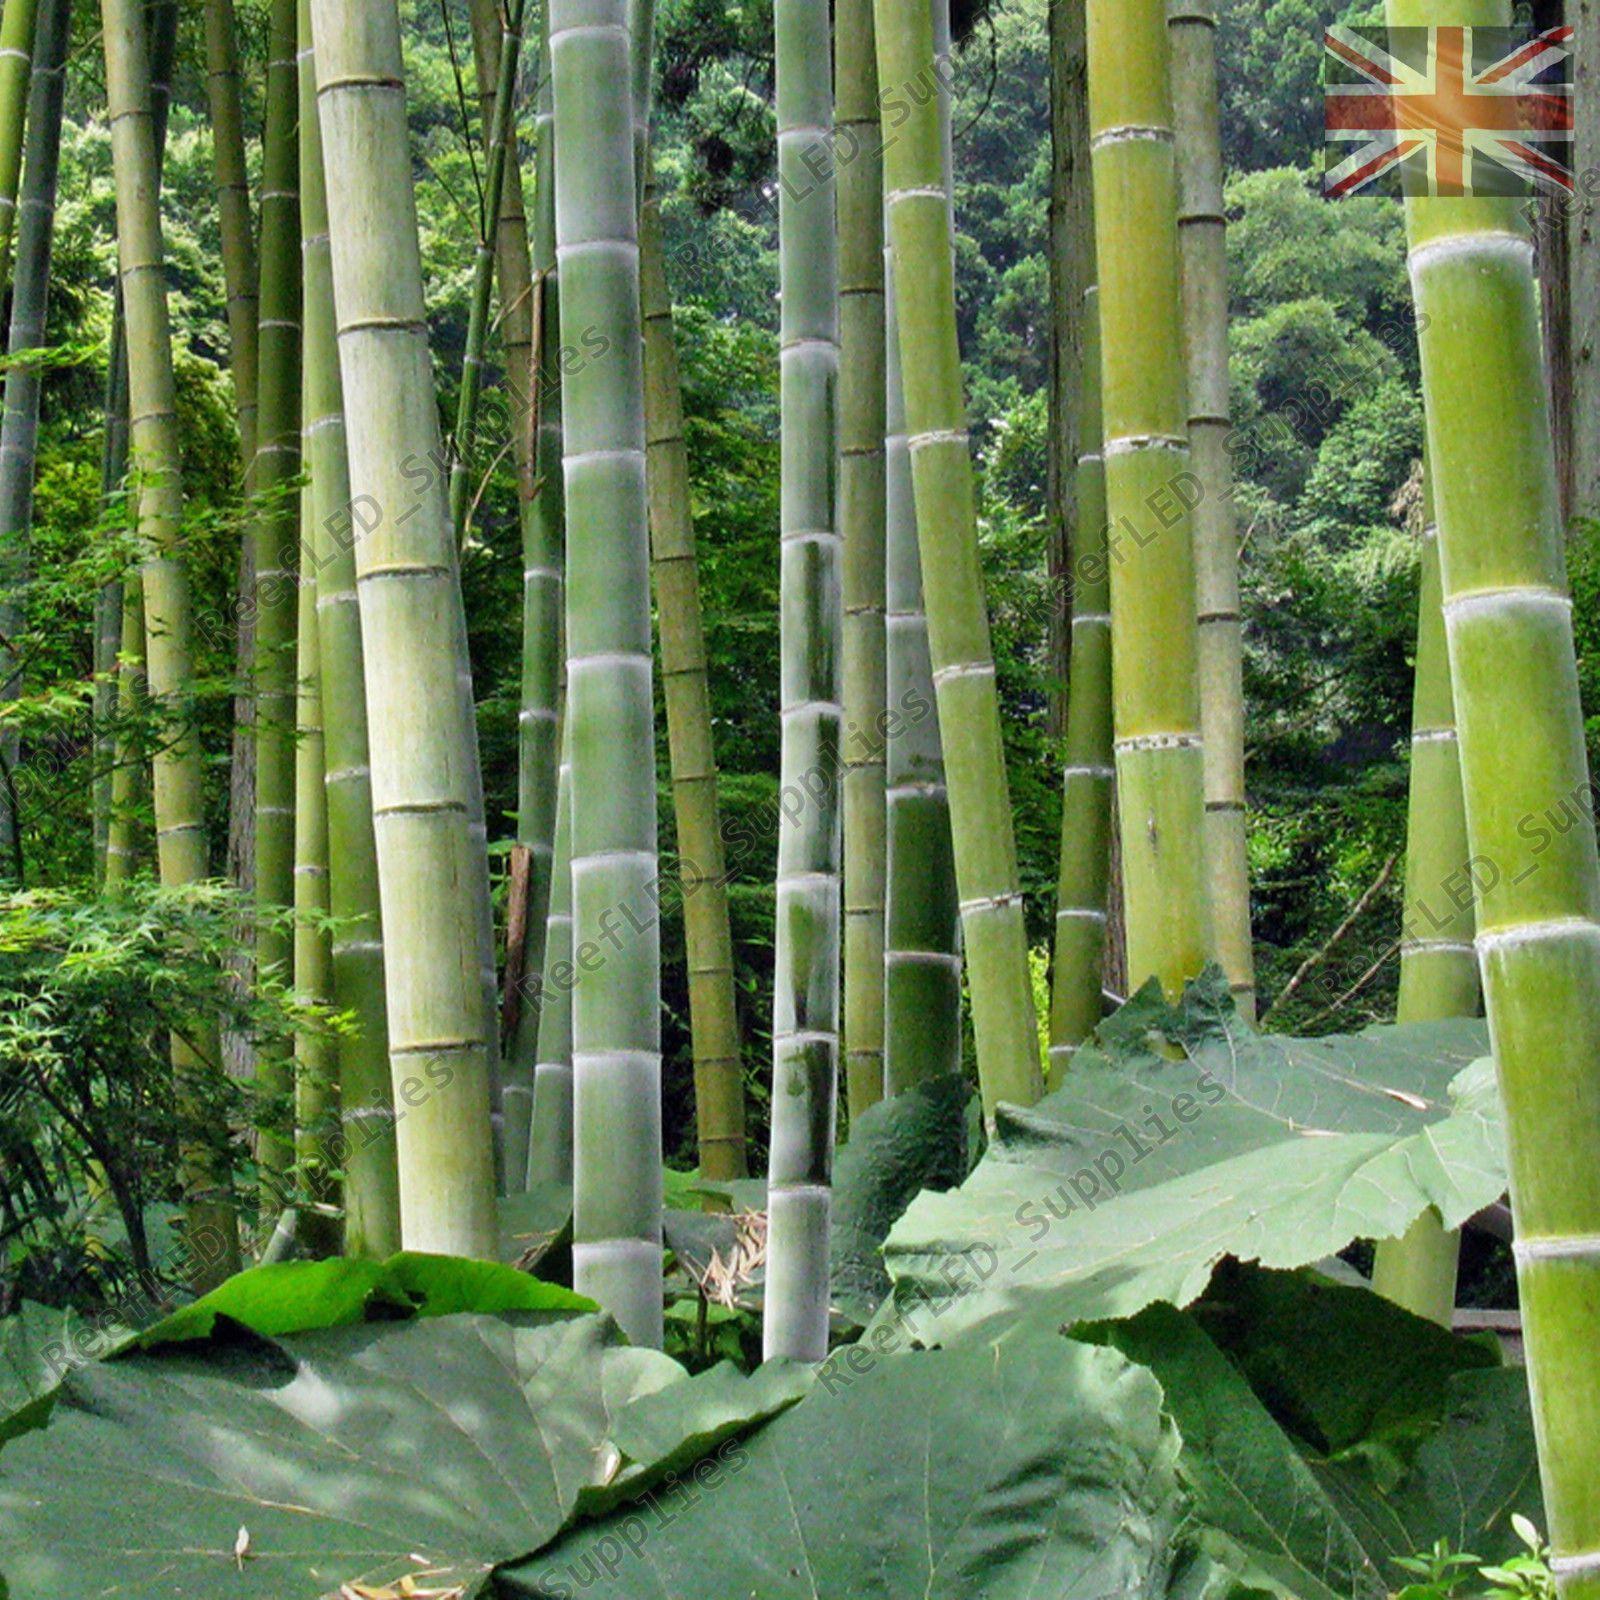 100 Moso Bambus Samen Phyllostachys Pubescens Riesige Bambussamen Lot von 100 Samen Freies Verschiffen